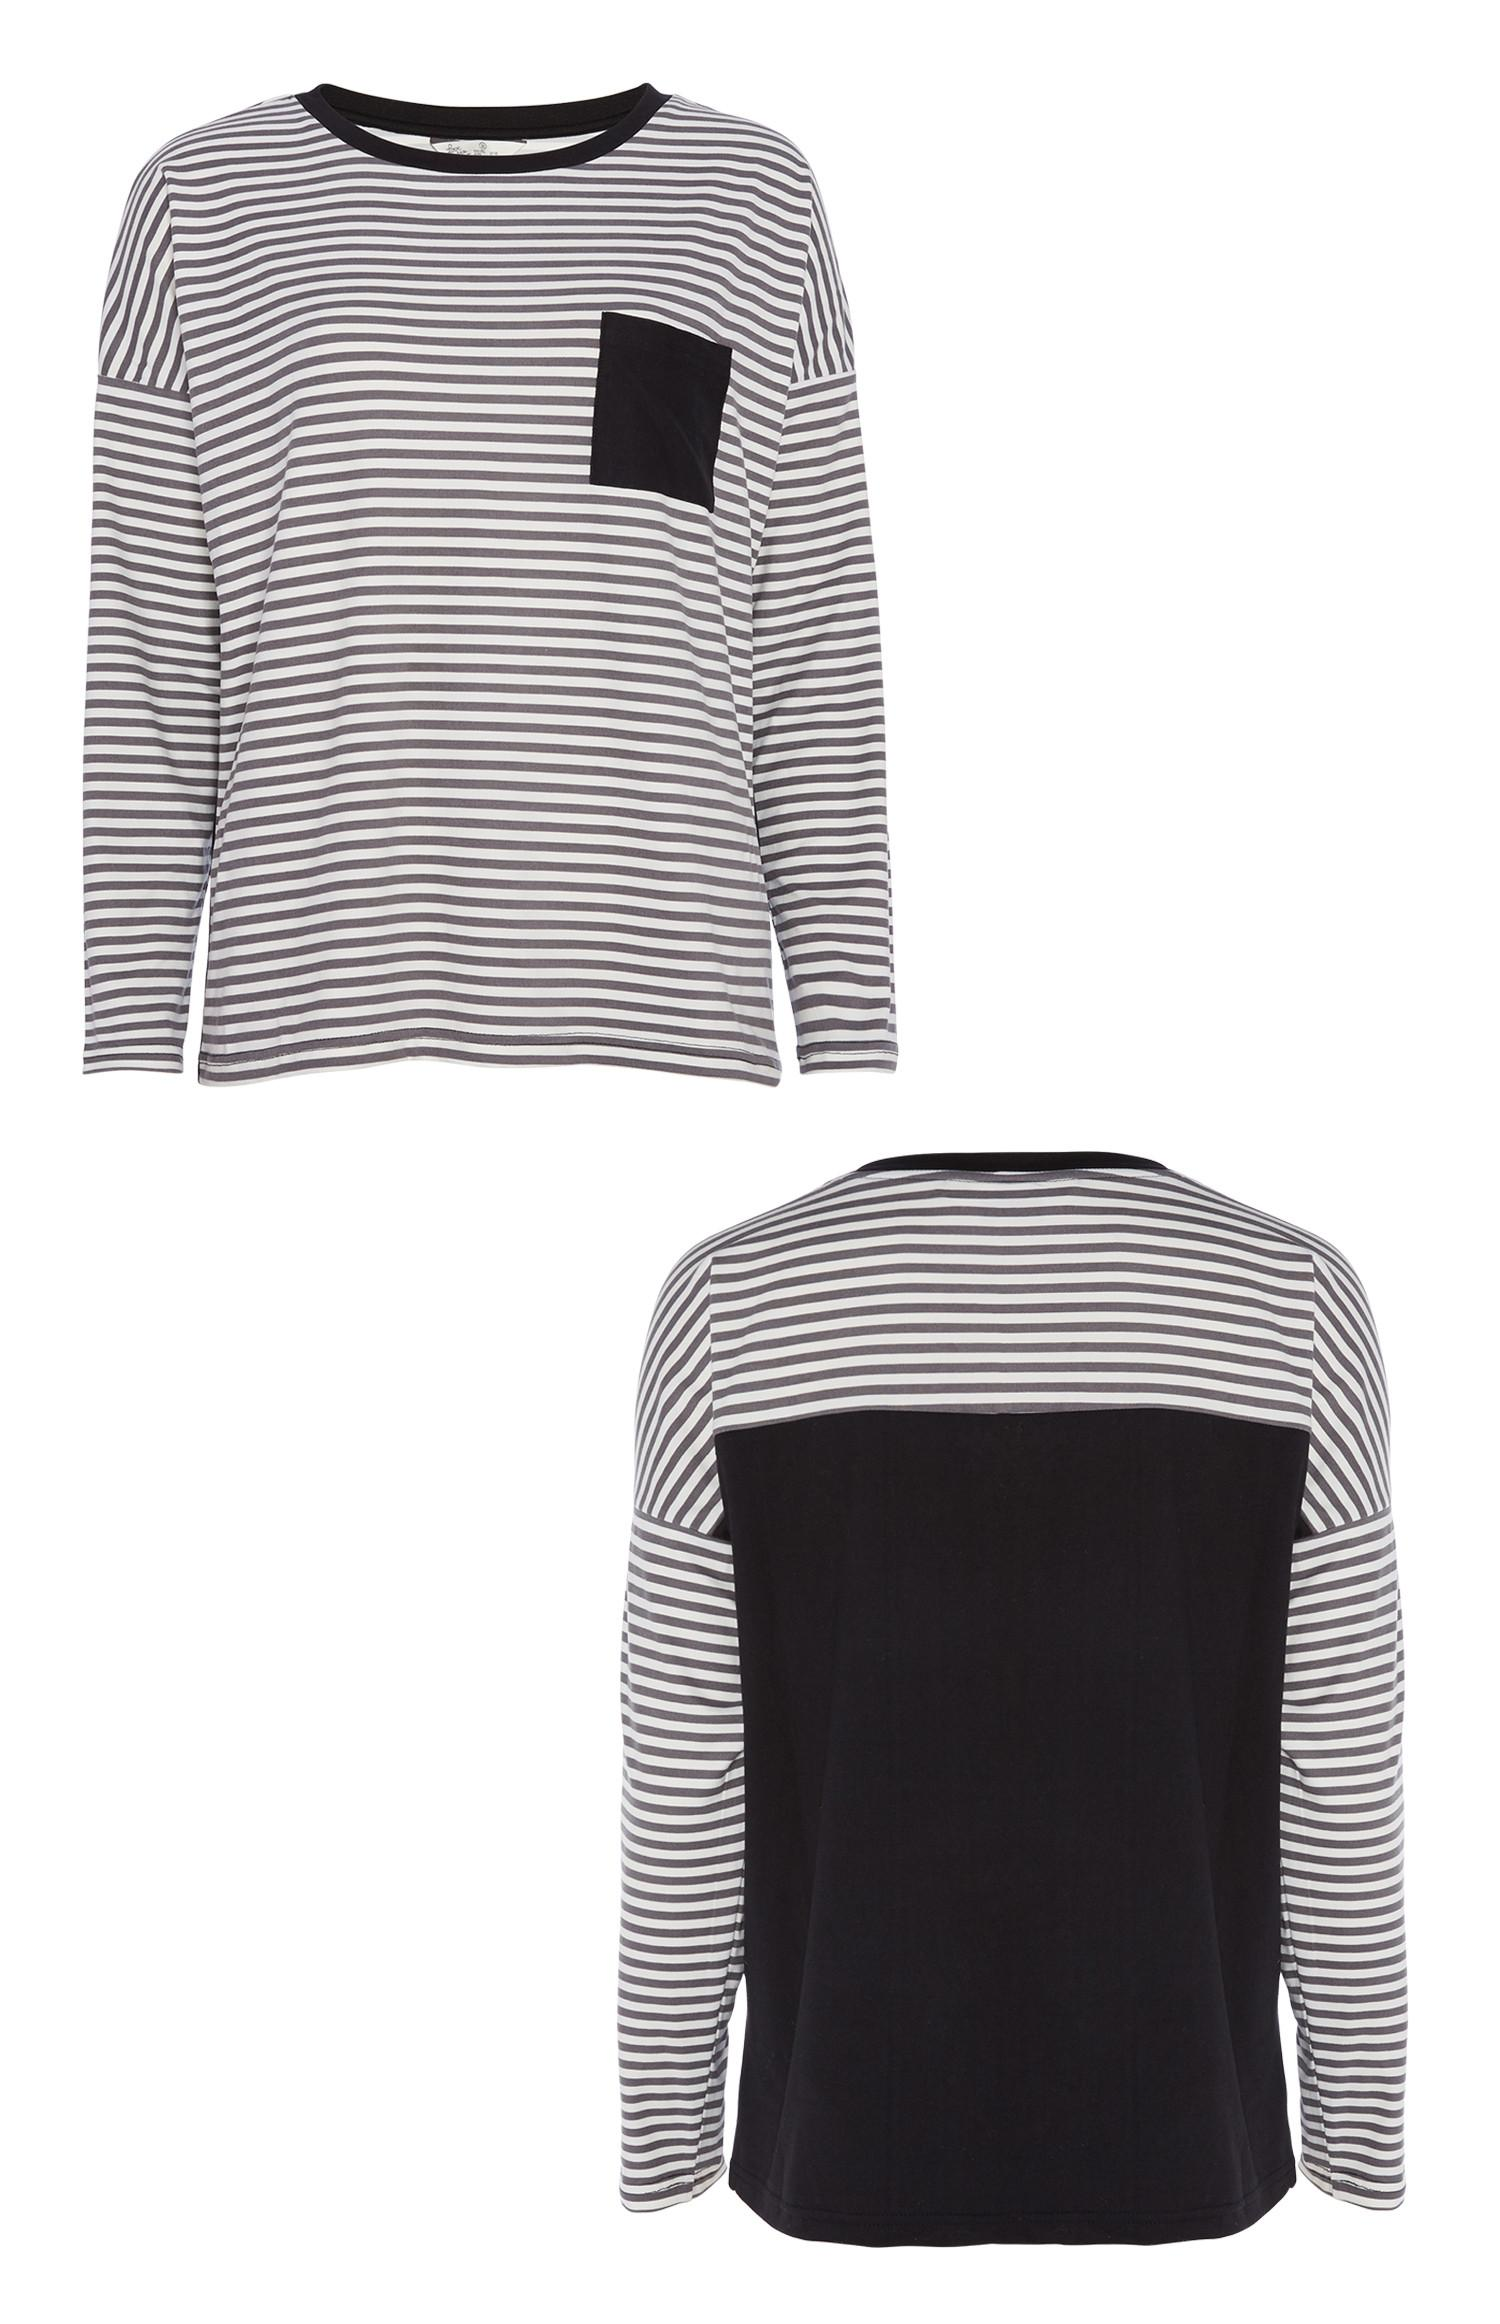 Schwarz gestreiftes Pyjamatop